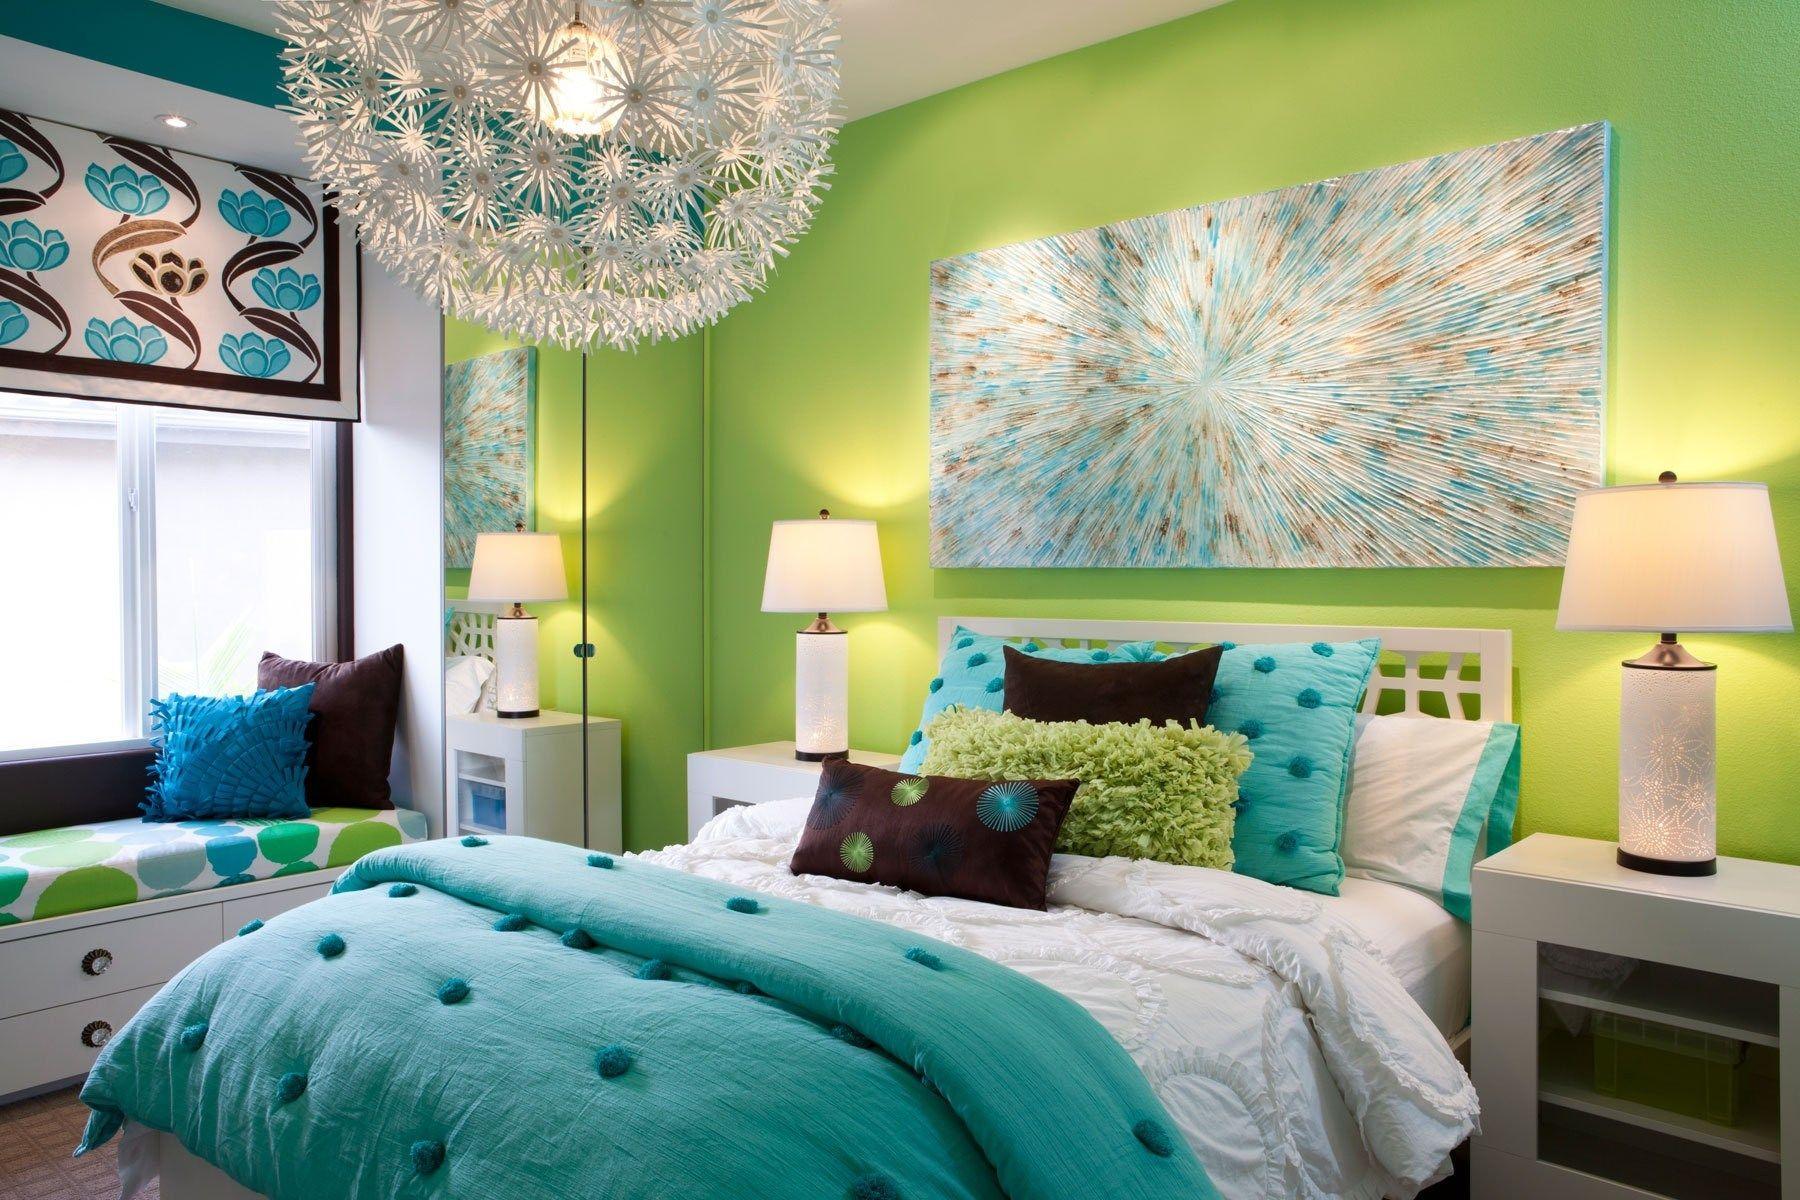 105 Harga Wallpaper Dinding iKamari Tidur iWarnai Biru